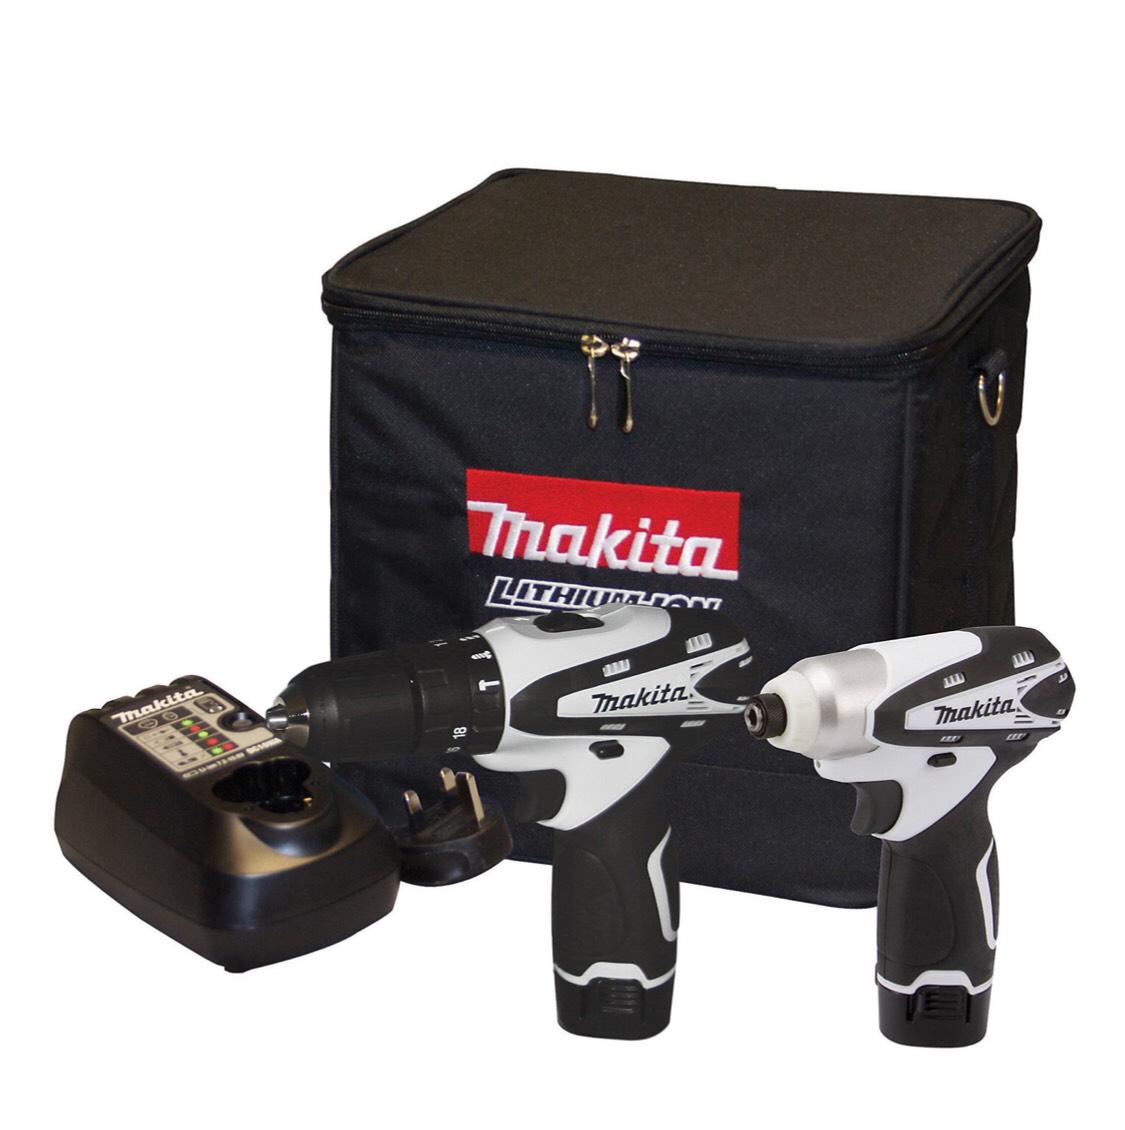 Makita 1.3Ah Li-ion Combi drill & impact driver twin pack 2 batteries DK1486W